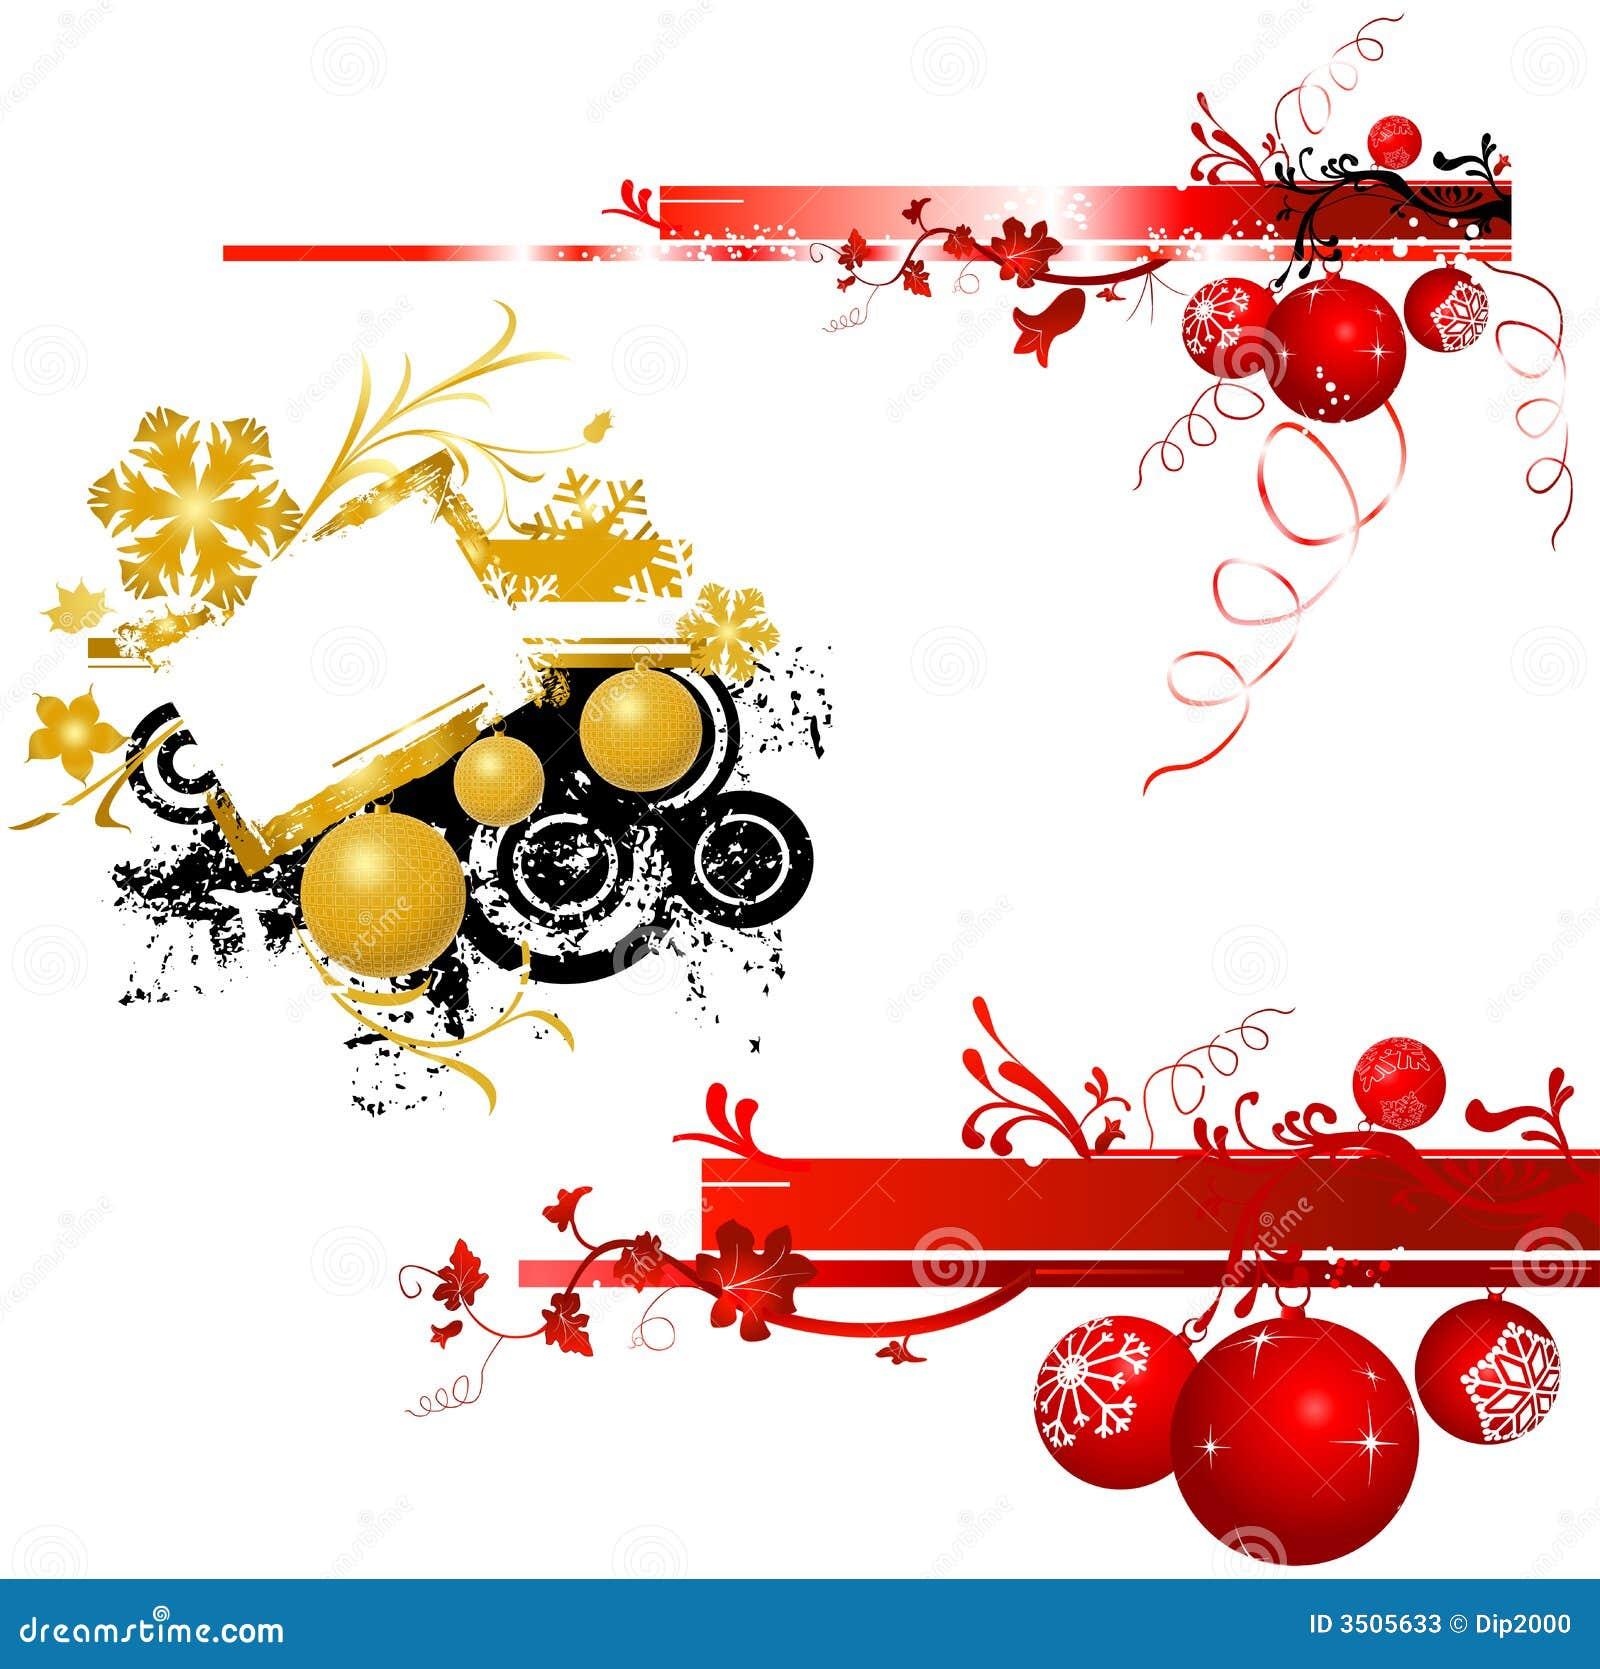 christmas design stock photos - image: 3505633